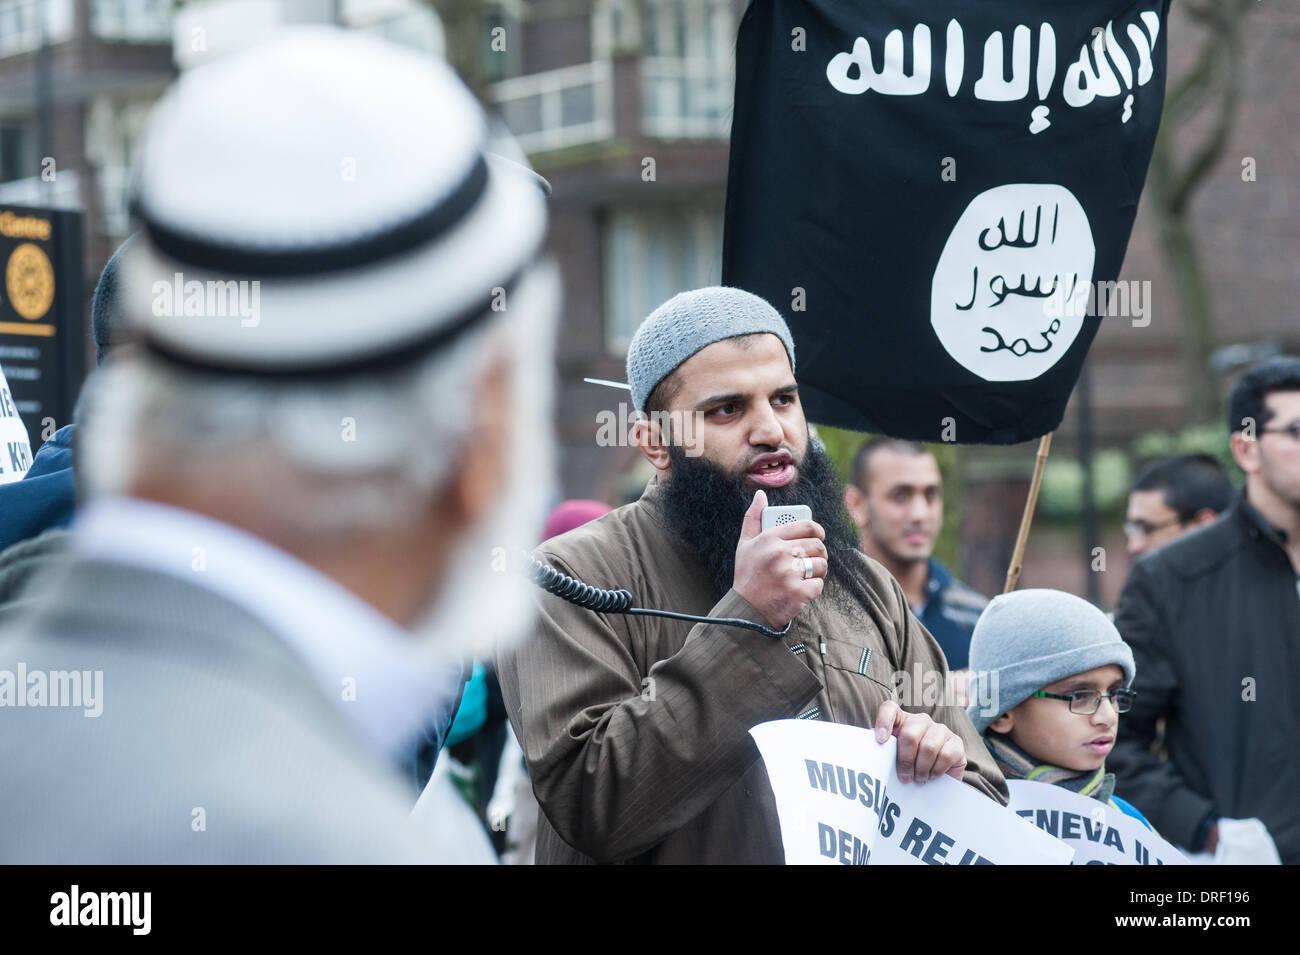 London, UK. 24th January 2014.  Abu Walaa, founder of Muslim Prisoners, addresses the audience outside the Regents Park Mosque. Credit:  Piero Cruciatti/Alamy Live News - Stock Image